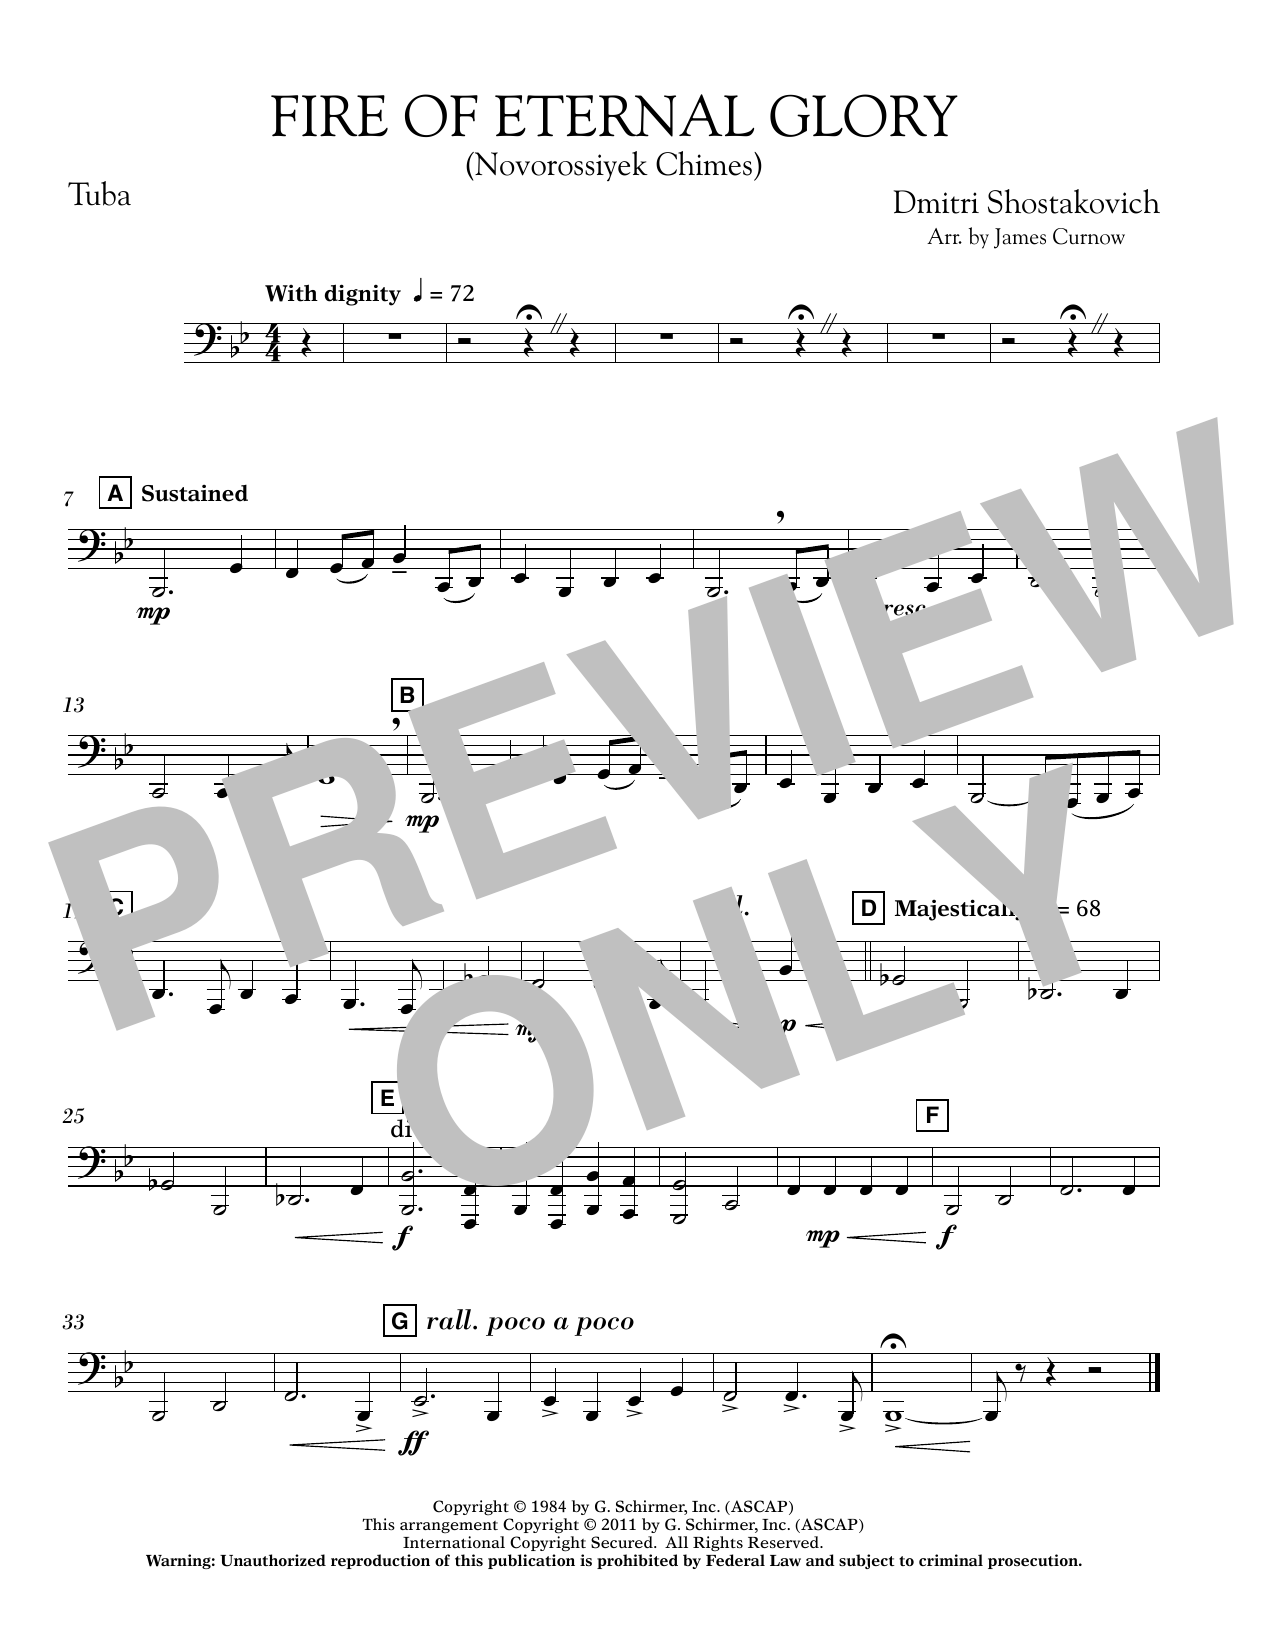 James Curnow Fire of Eternal Glory (Novorossiyek Chimes) - Tuba sheet music notes printable PDF score